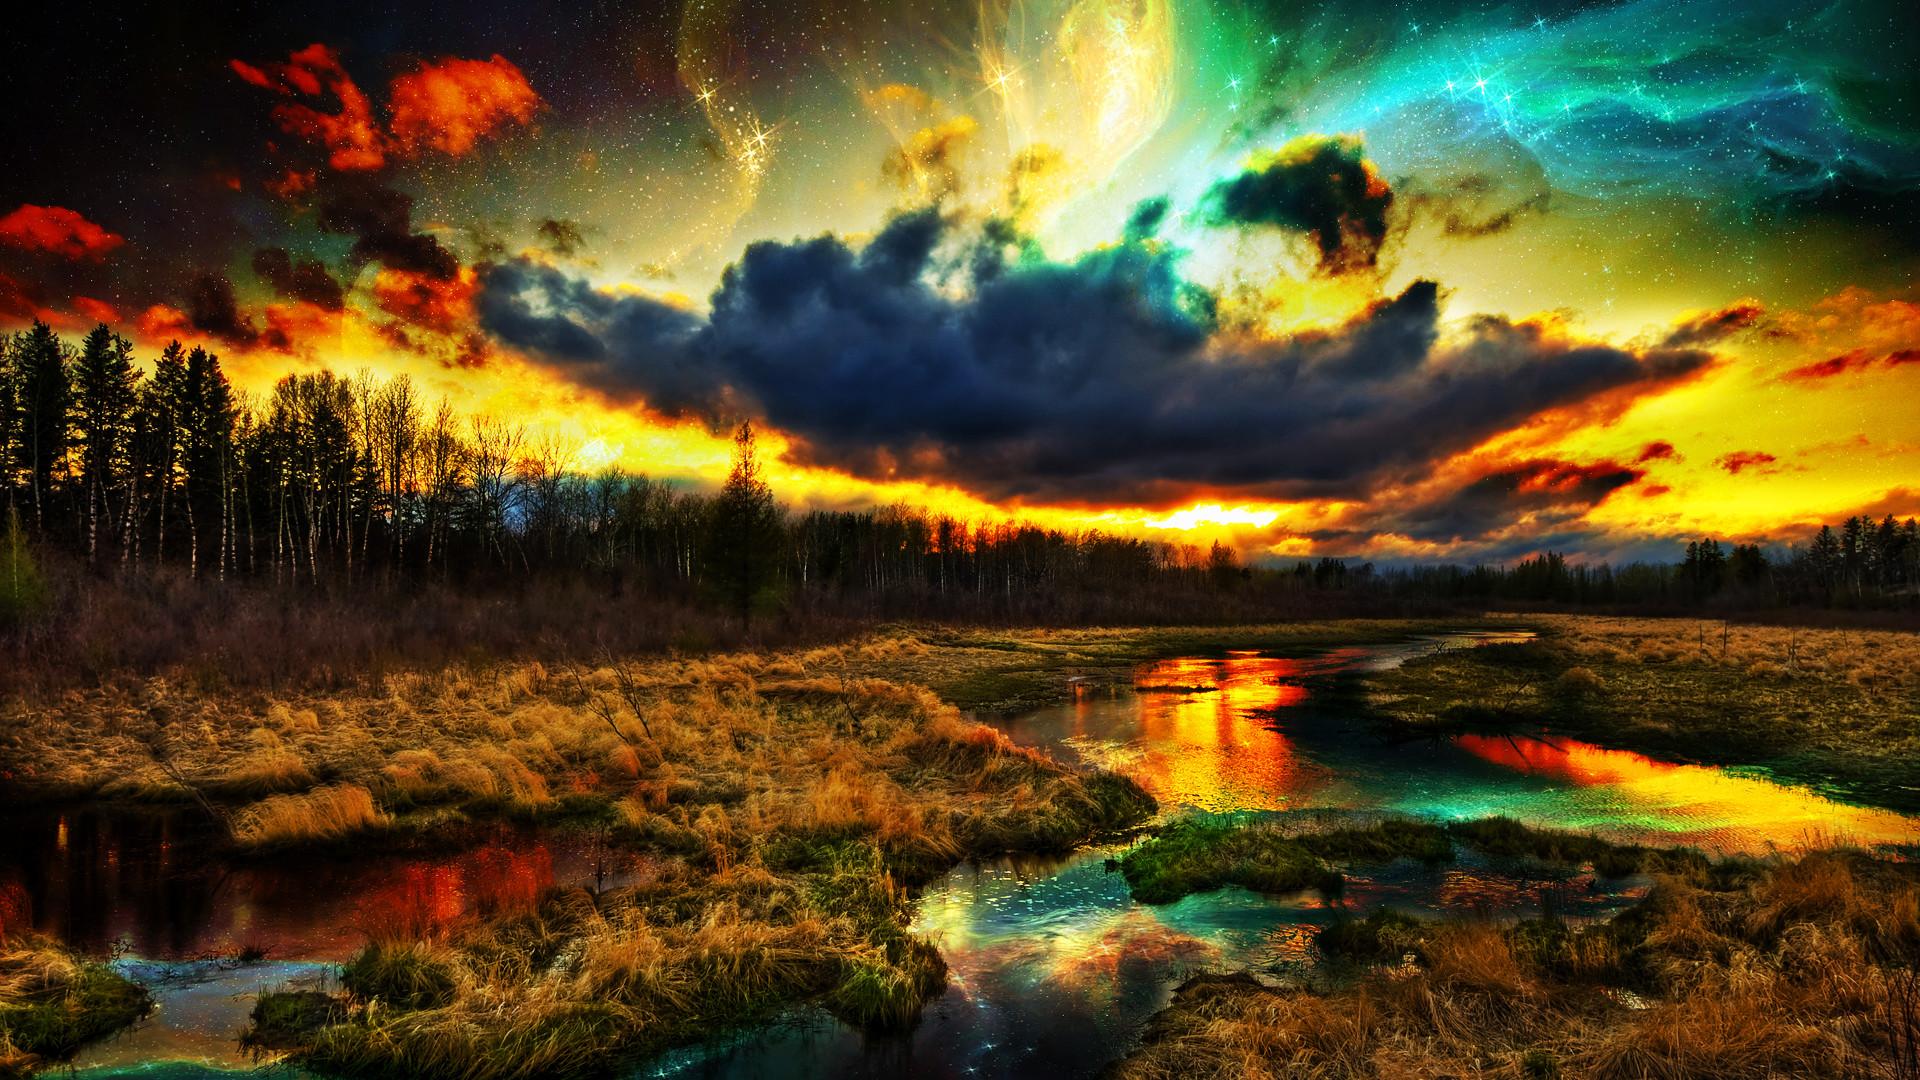 … Sci-Fi Landscape Wallpaper by NIHILUSDESIGNS